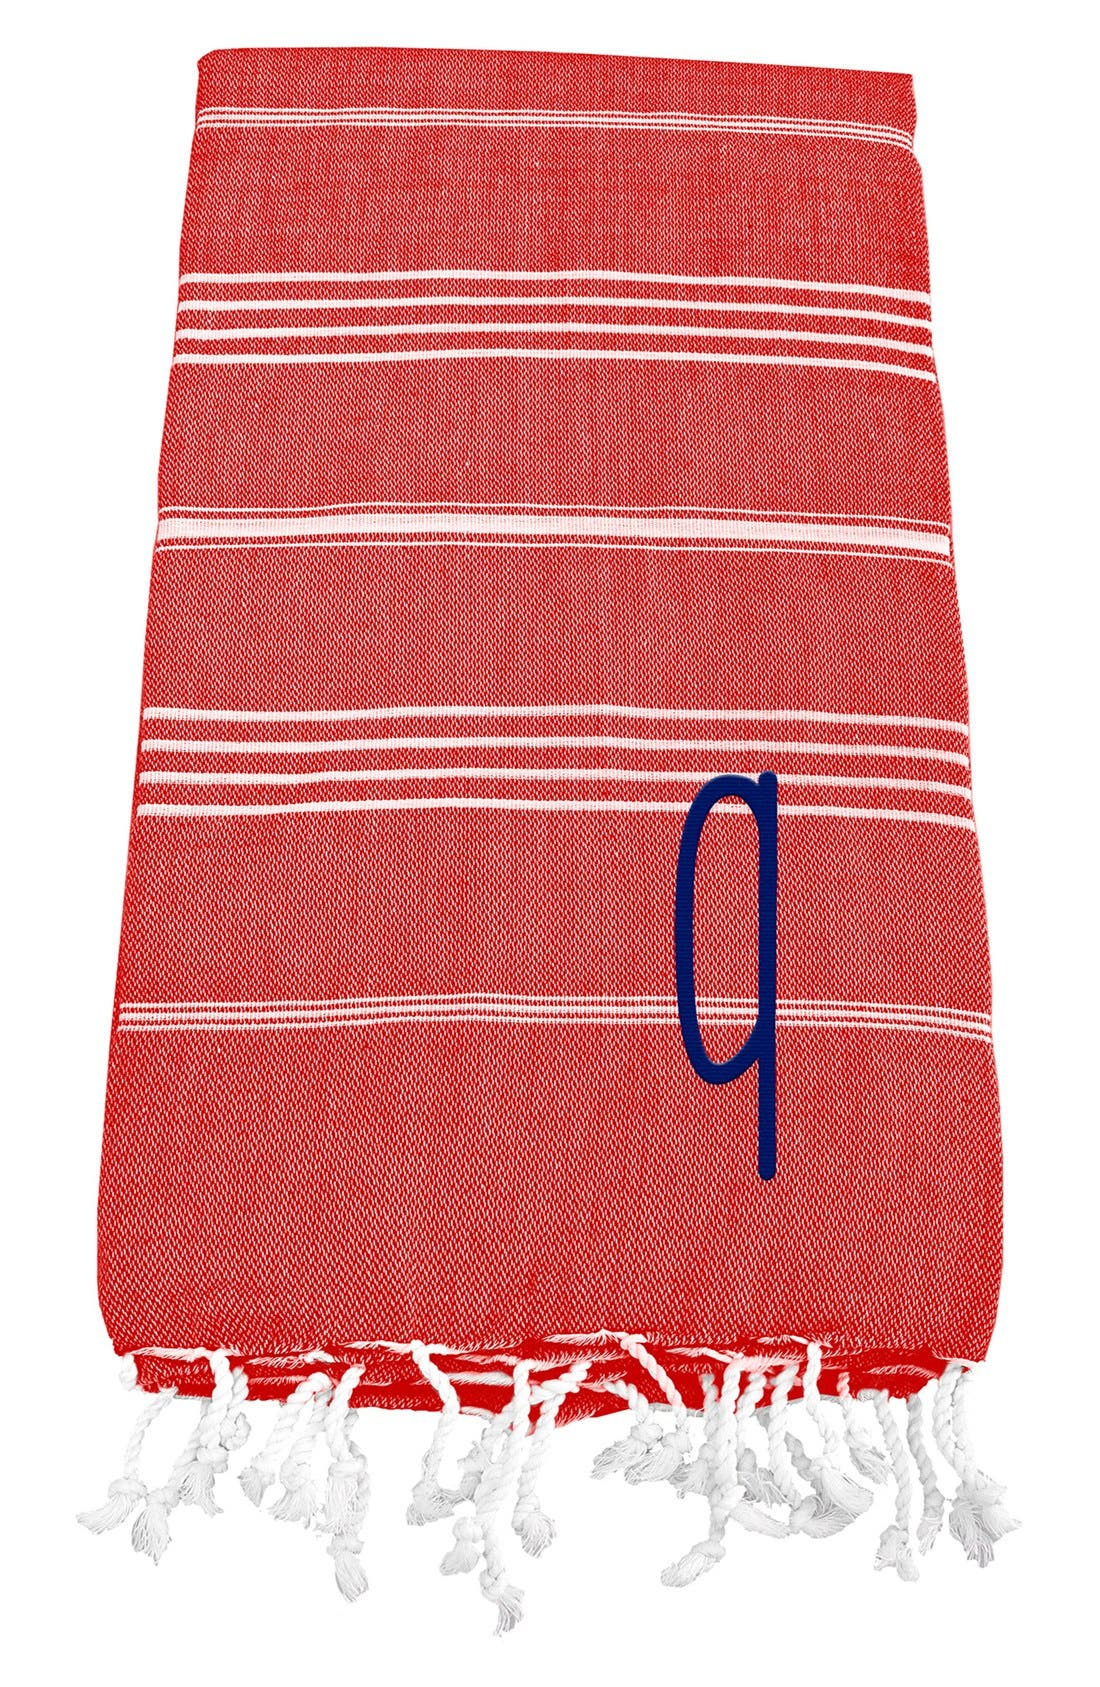 Main Image - Cathy's Concepts Monogram Turkish Cotton Towel